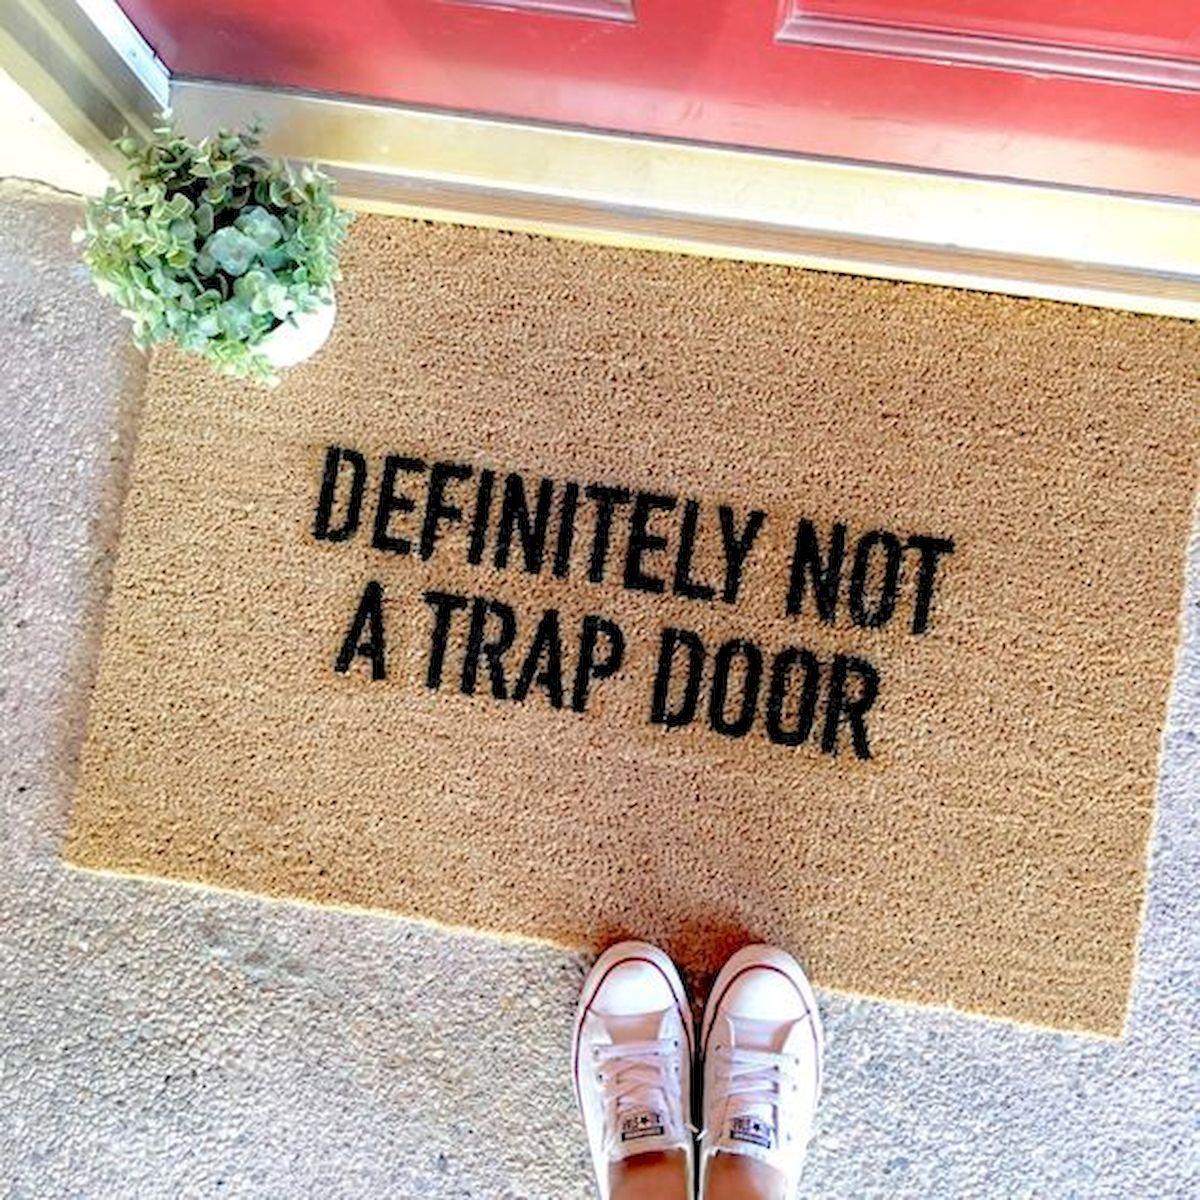 20 funny rug door mats design ideas home entryway decor homegorgeous 20 funny rug door mats design ideas s roomadness com